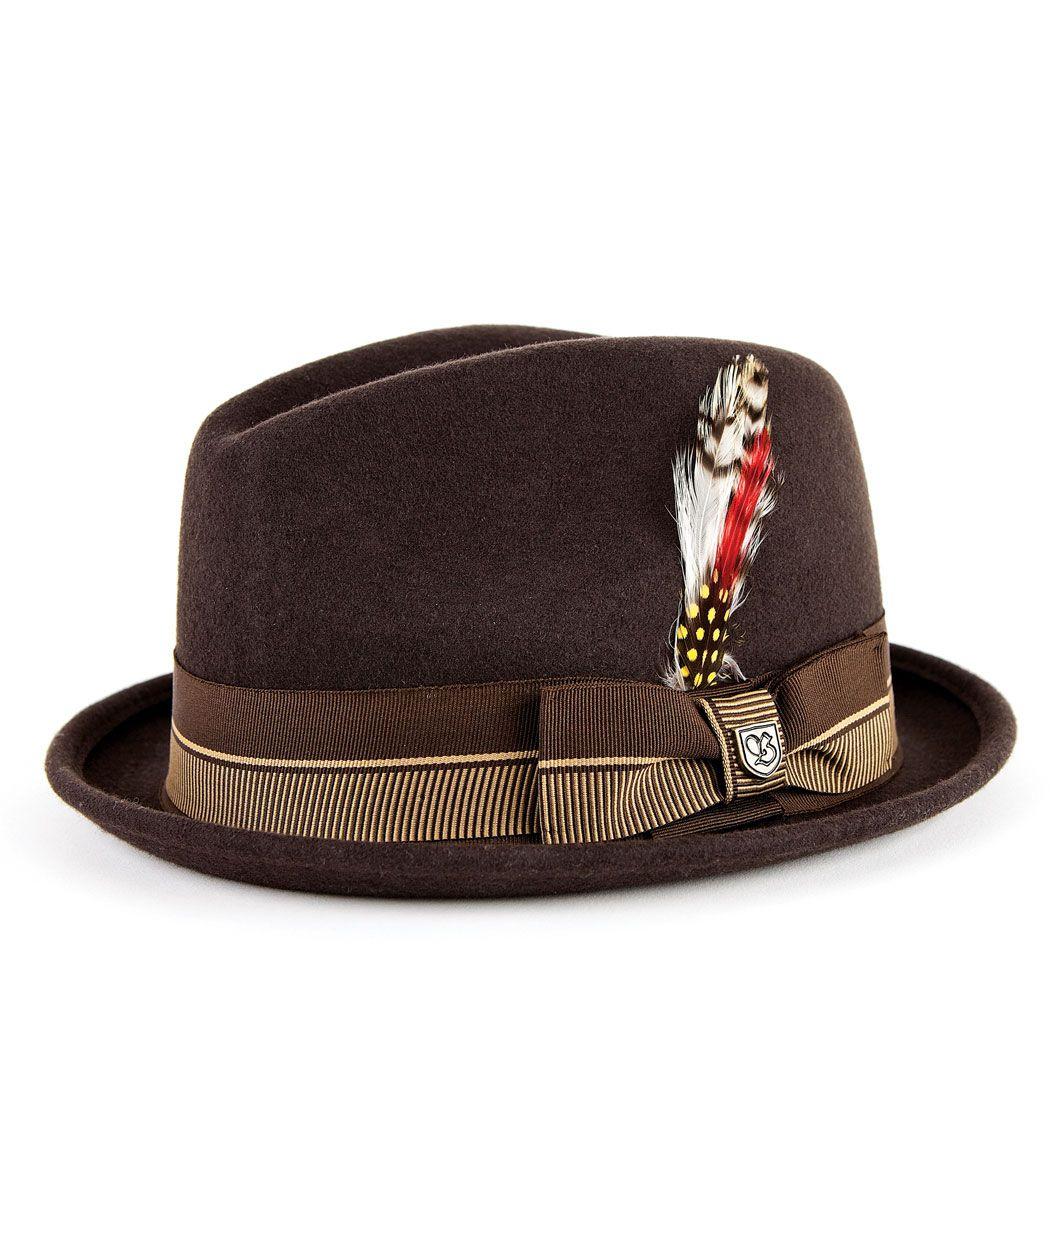 312ddb77f4e8 $80 The Gain Fedora Hat   Brixton Mens Hats   The Mens Shop   Mens Clothing  Online   Menswear Online & Accessories